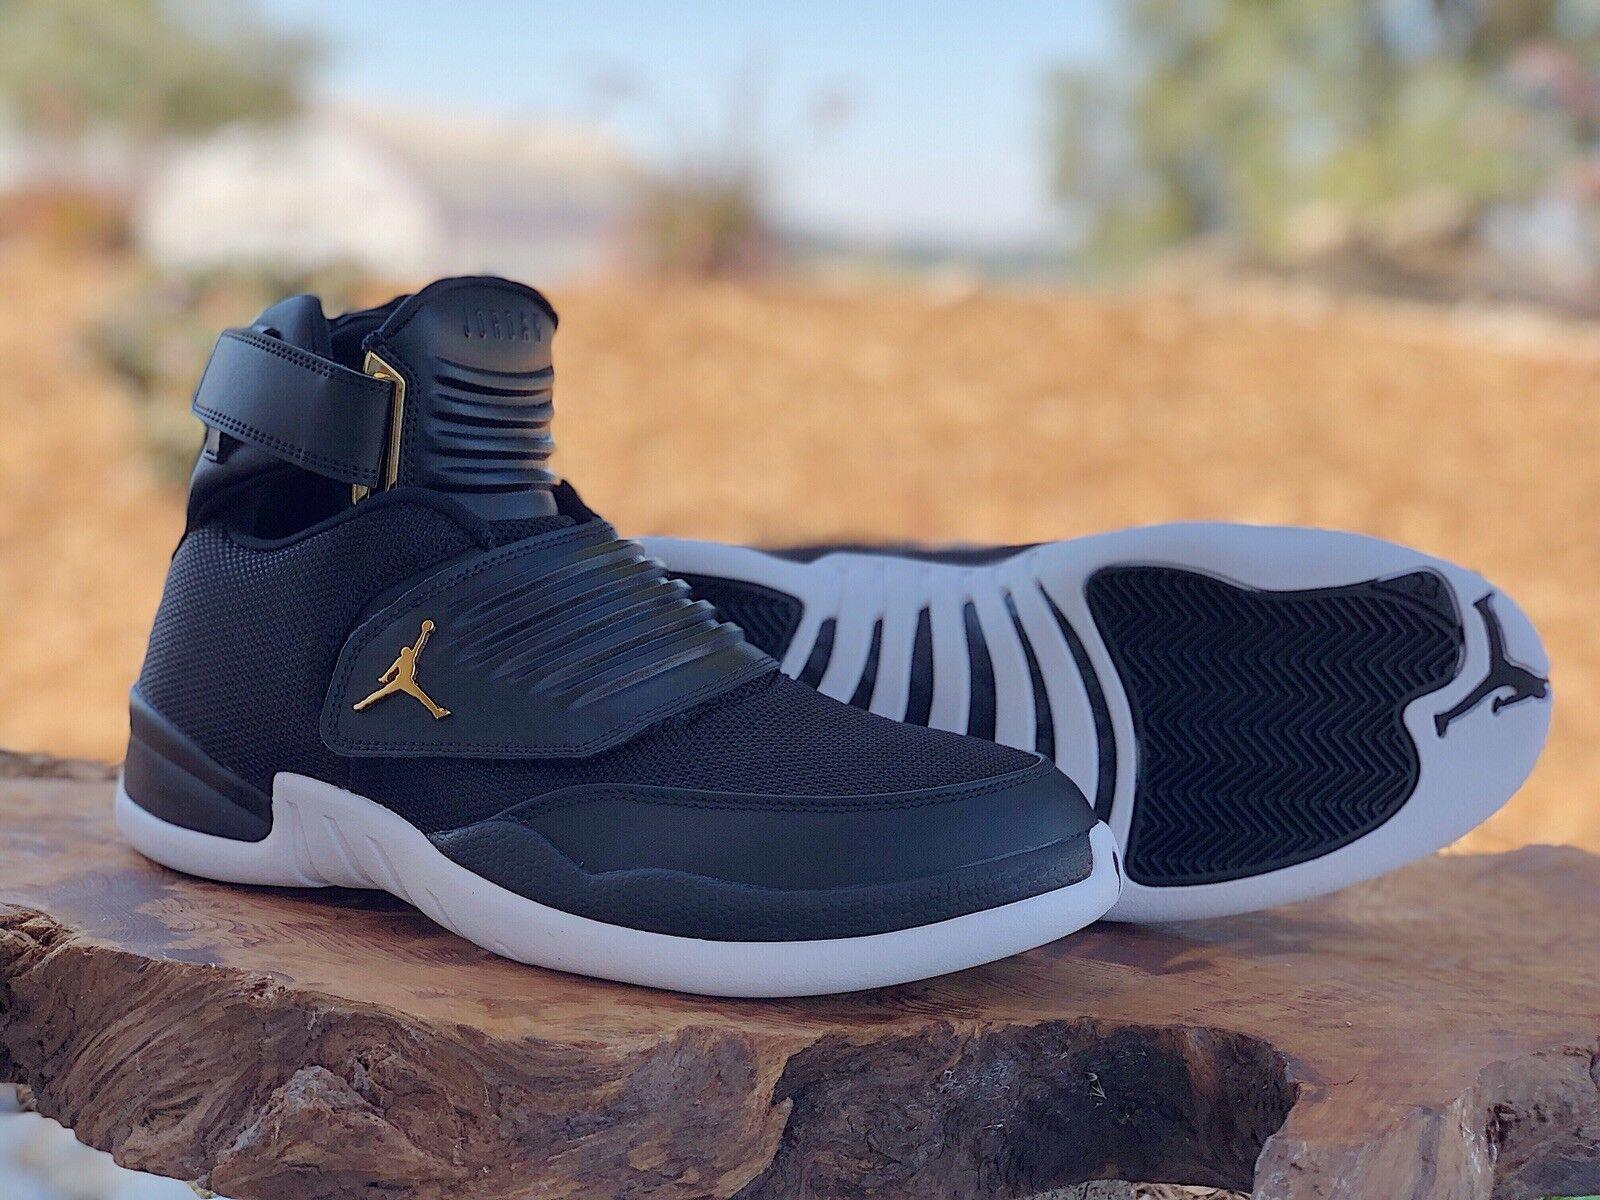 Homme Jordan génération 23 AA1294-021 Noir Noir NEUF Taille 10.5